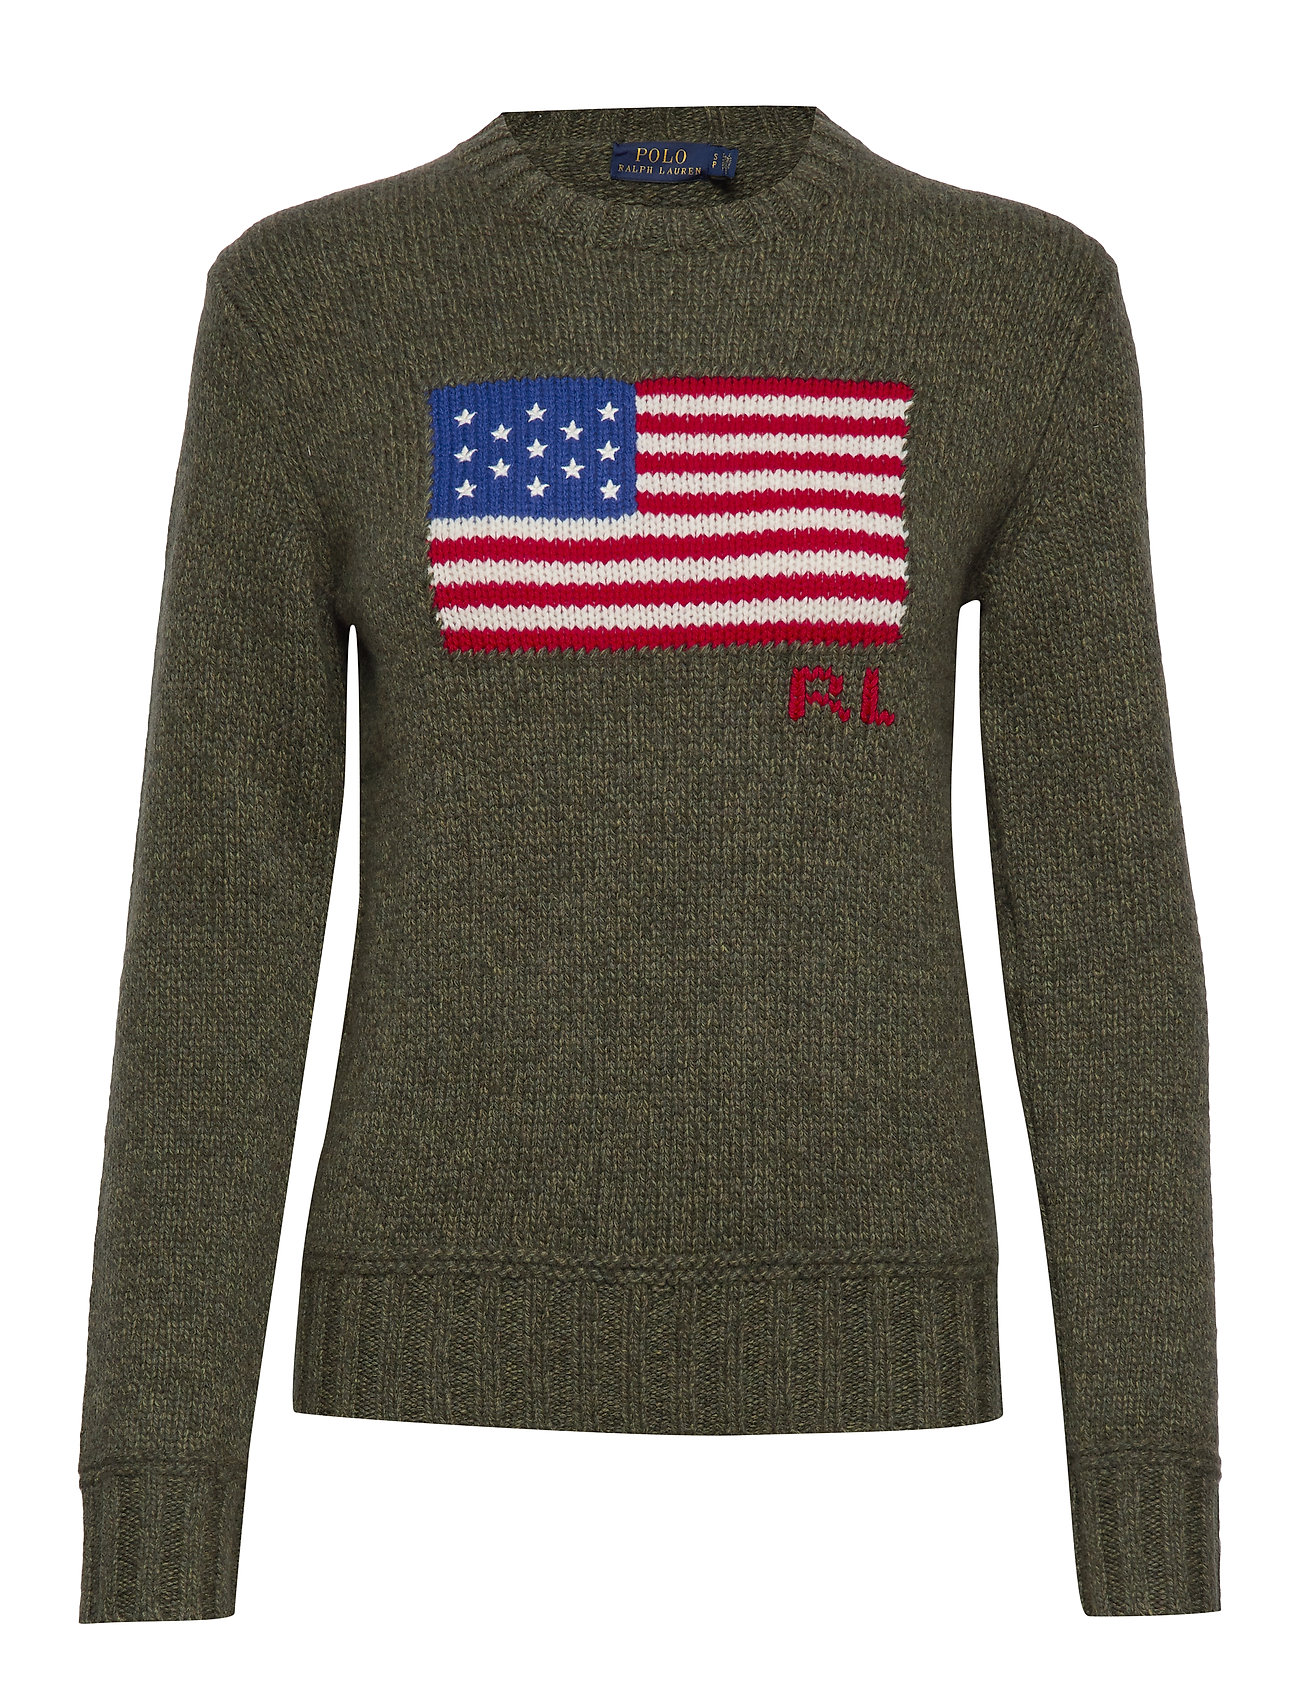 Polo Ralph Lauren Flag Wool-Blend Sweater - OLIVE RAGG MULTI